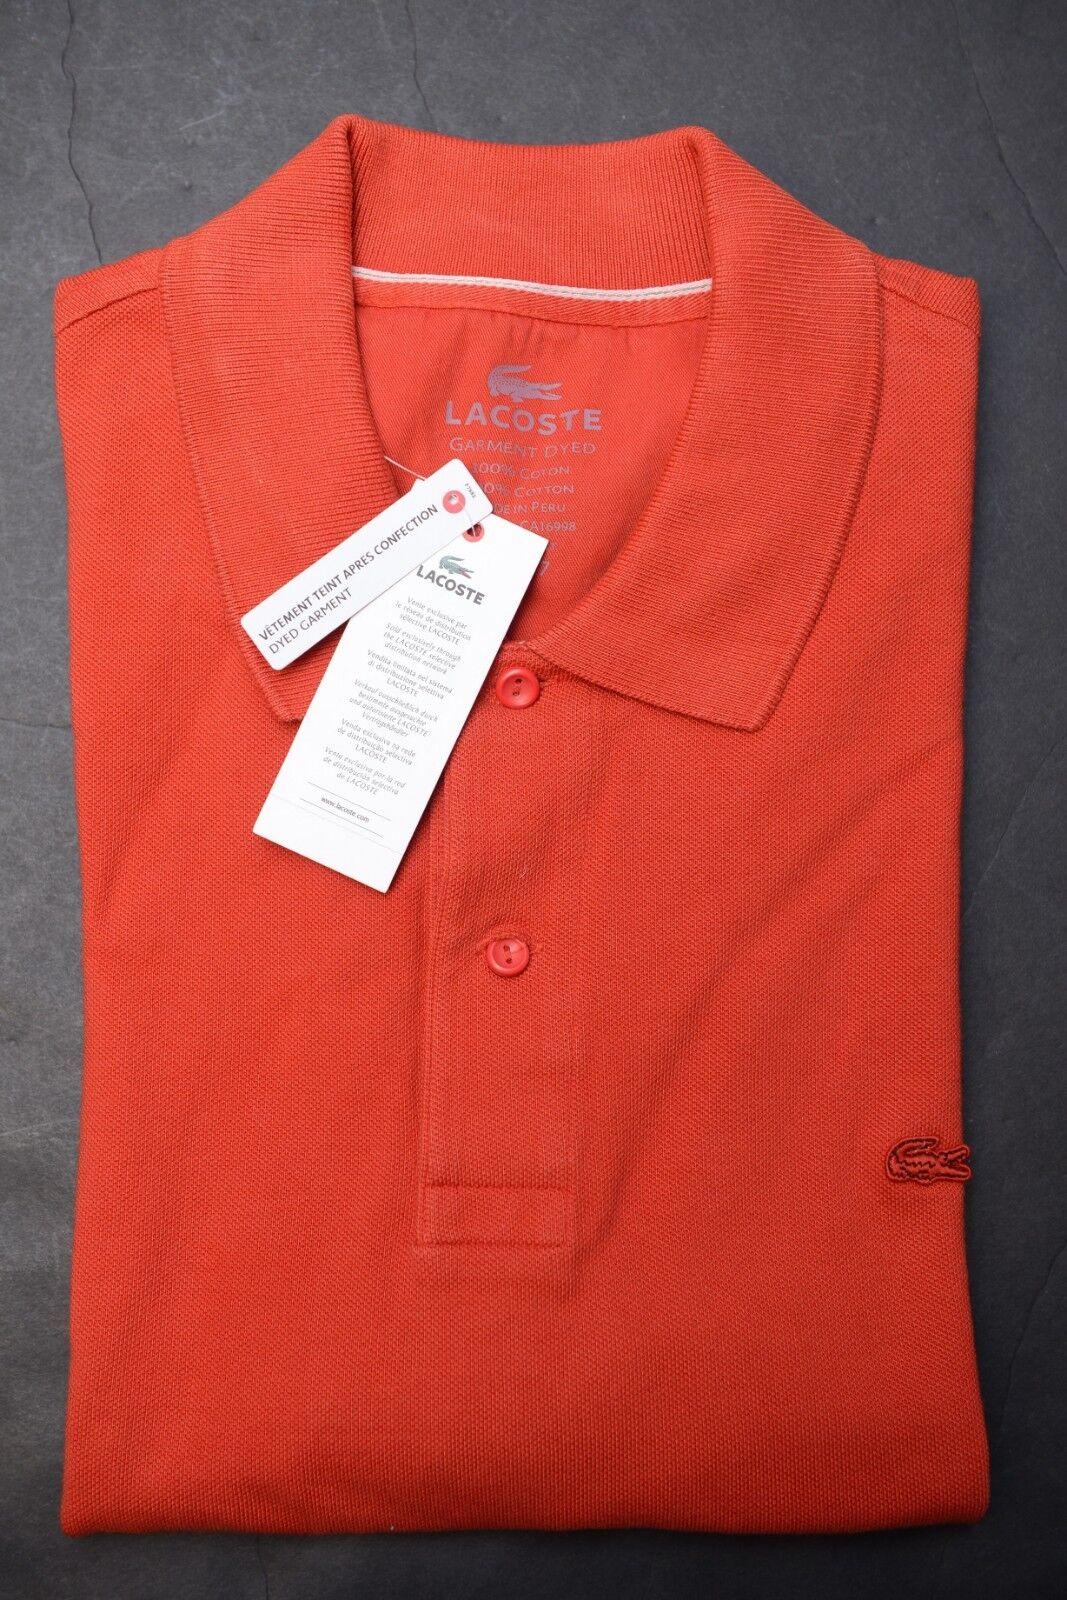 Lacoste Men's Regular Fit Dyed Garment Dark Red Mesh Cotton Polo Shirt 3XL 9